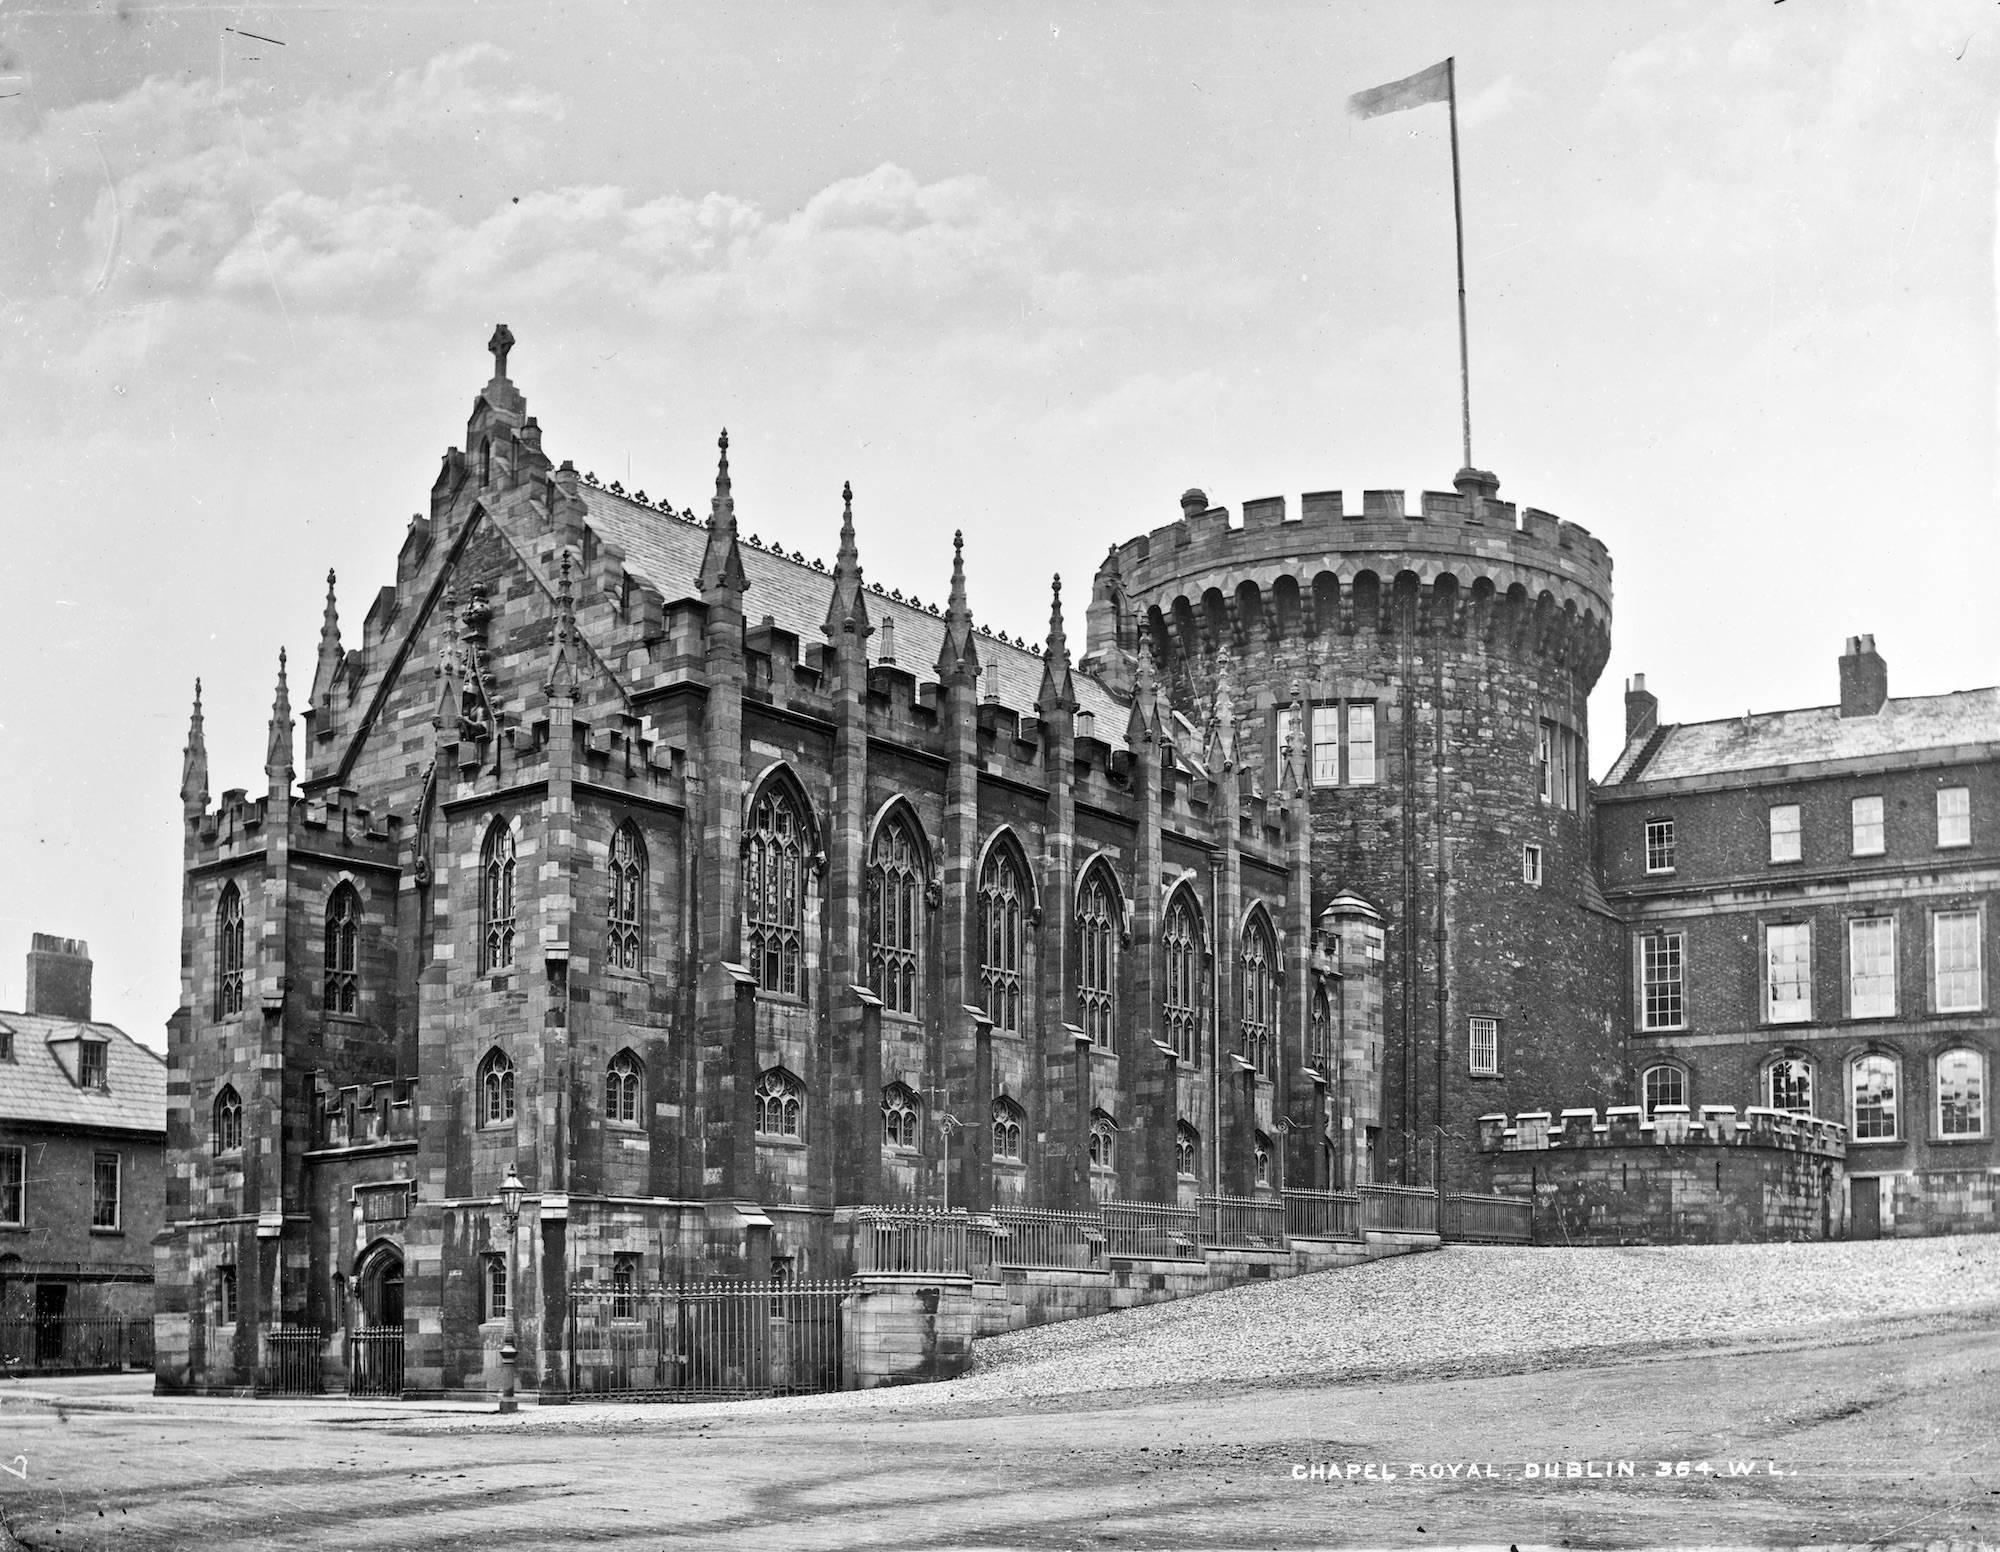 chapel royal dublin castle